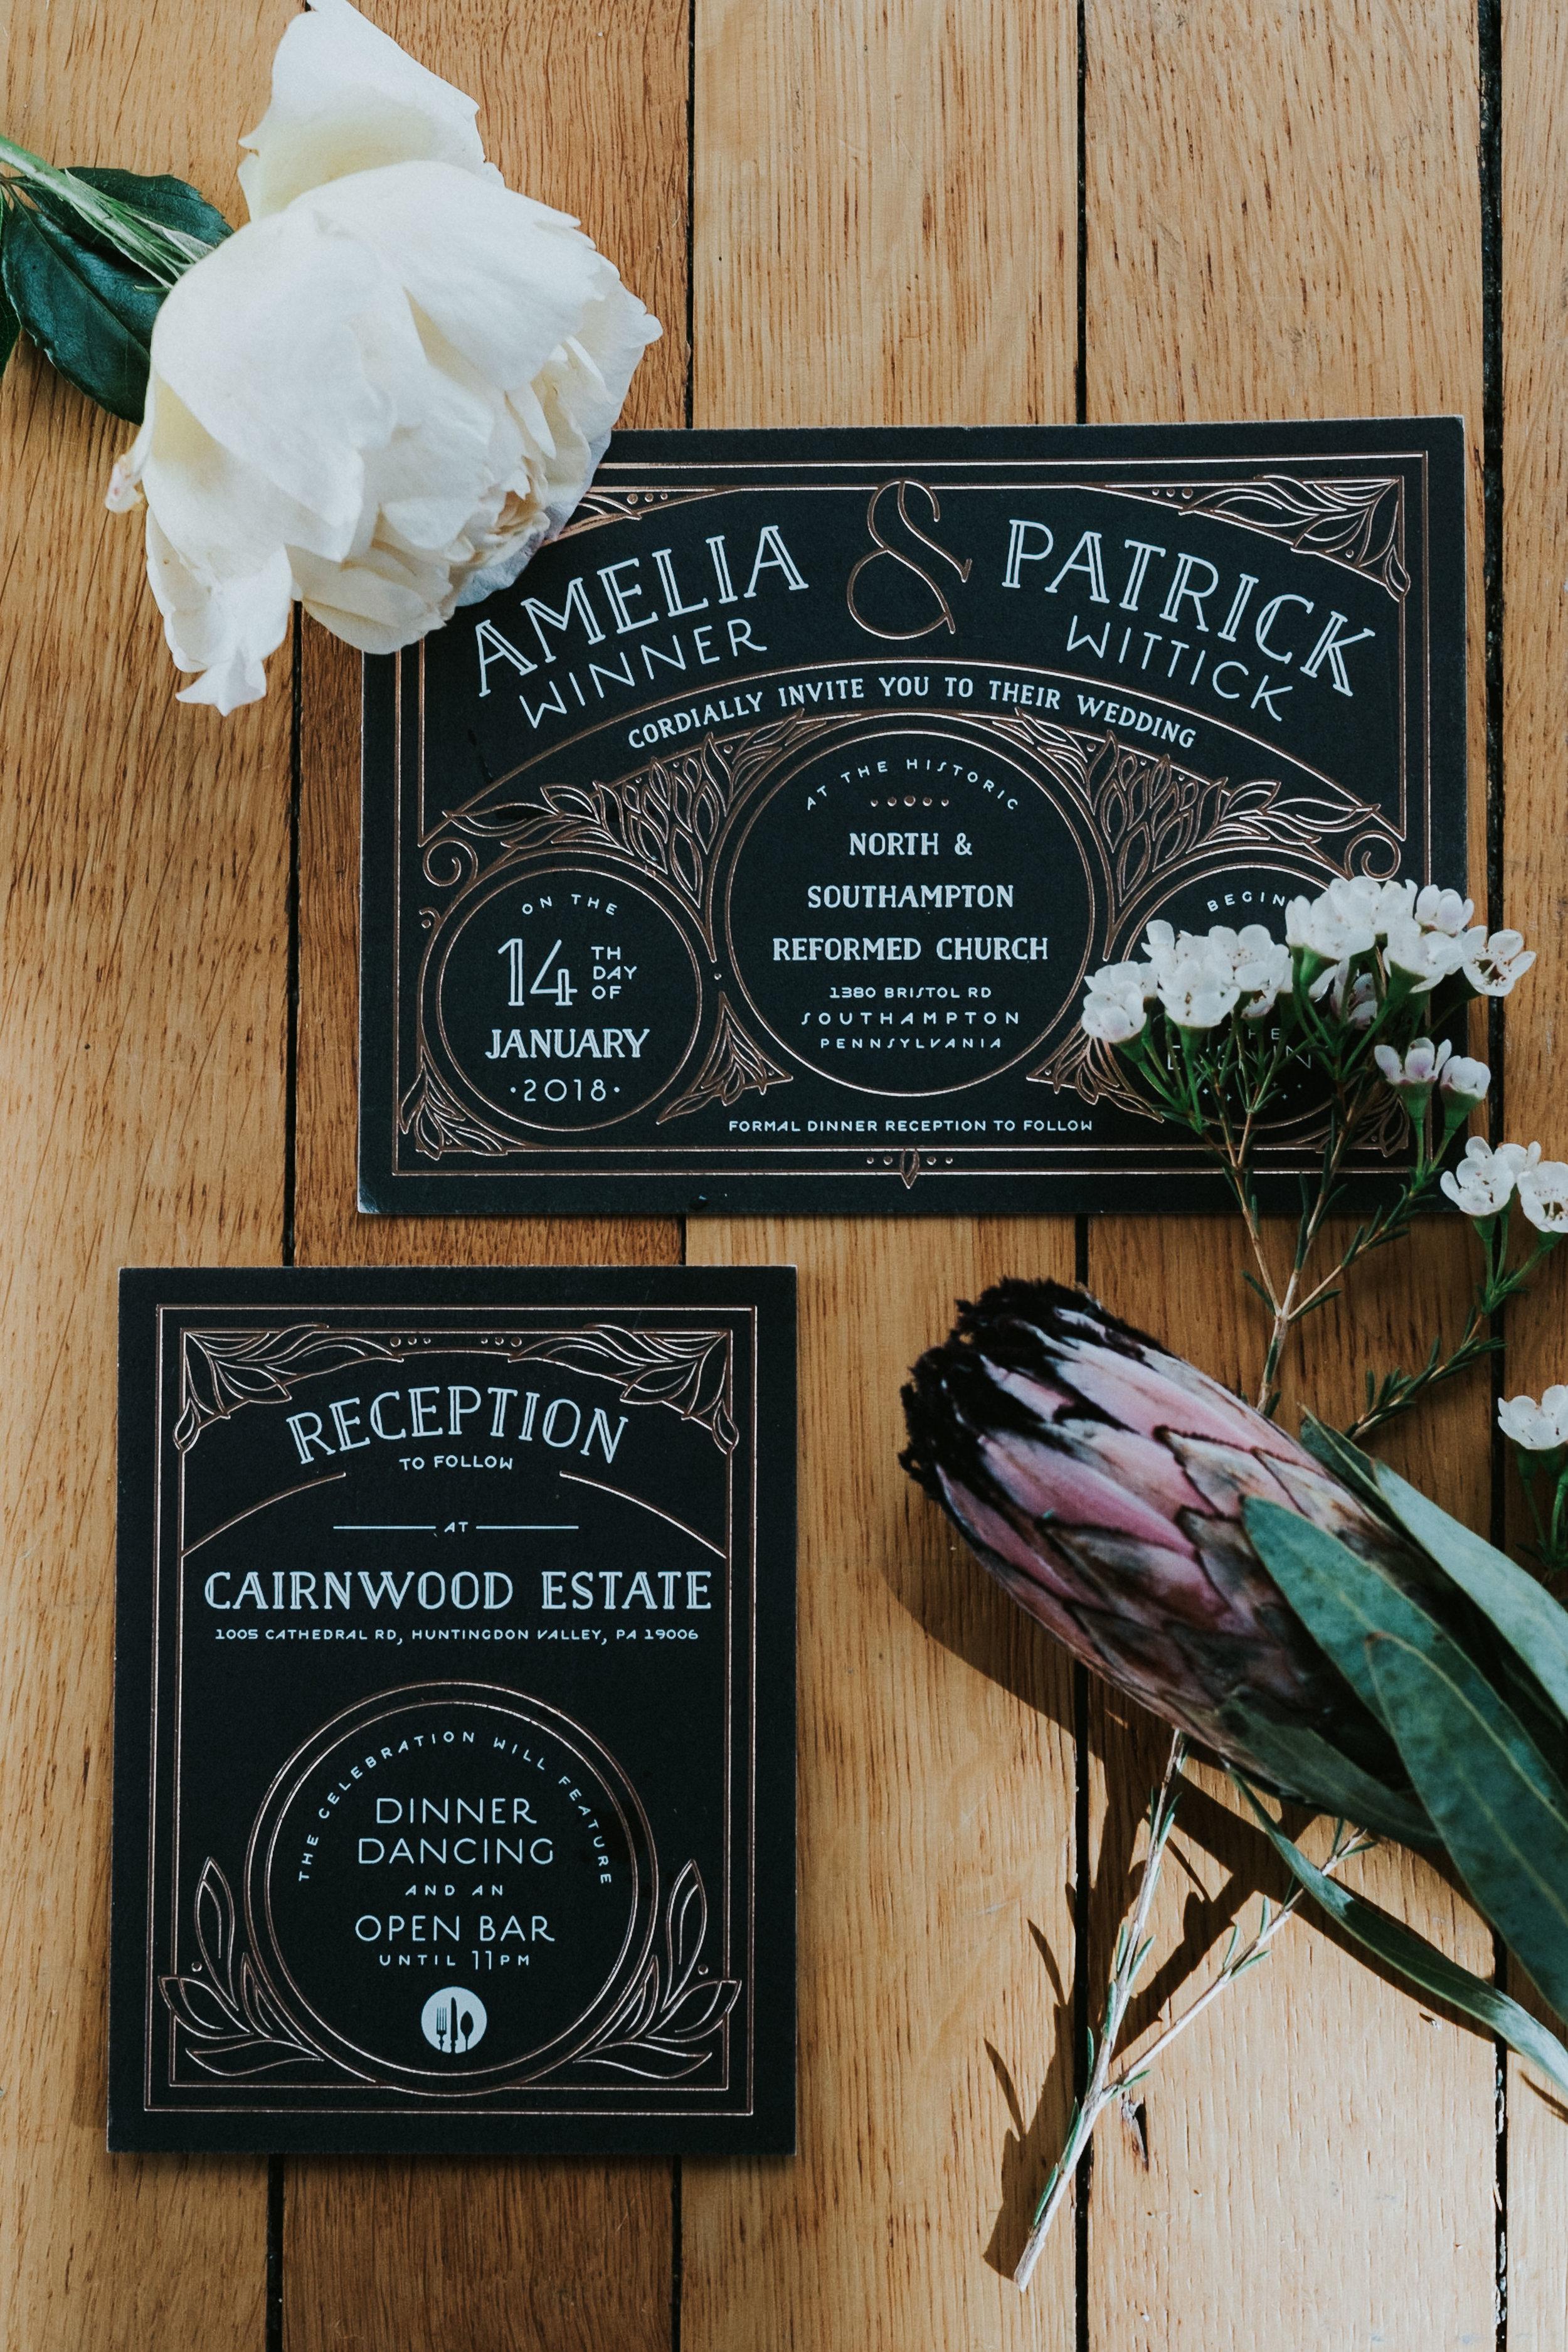 Cairnwood-Estate-Amelia-and-Patrick-Wedding-116.jpg